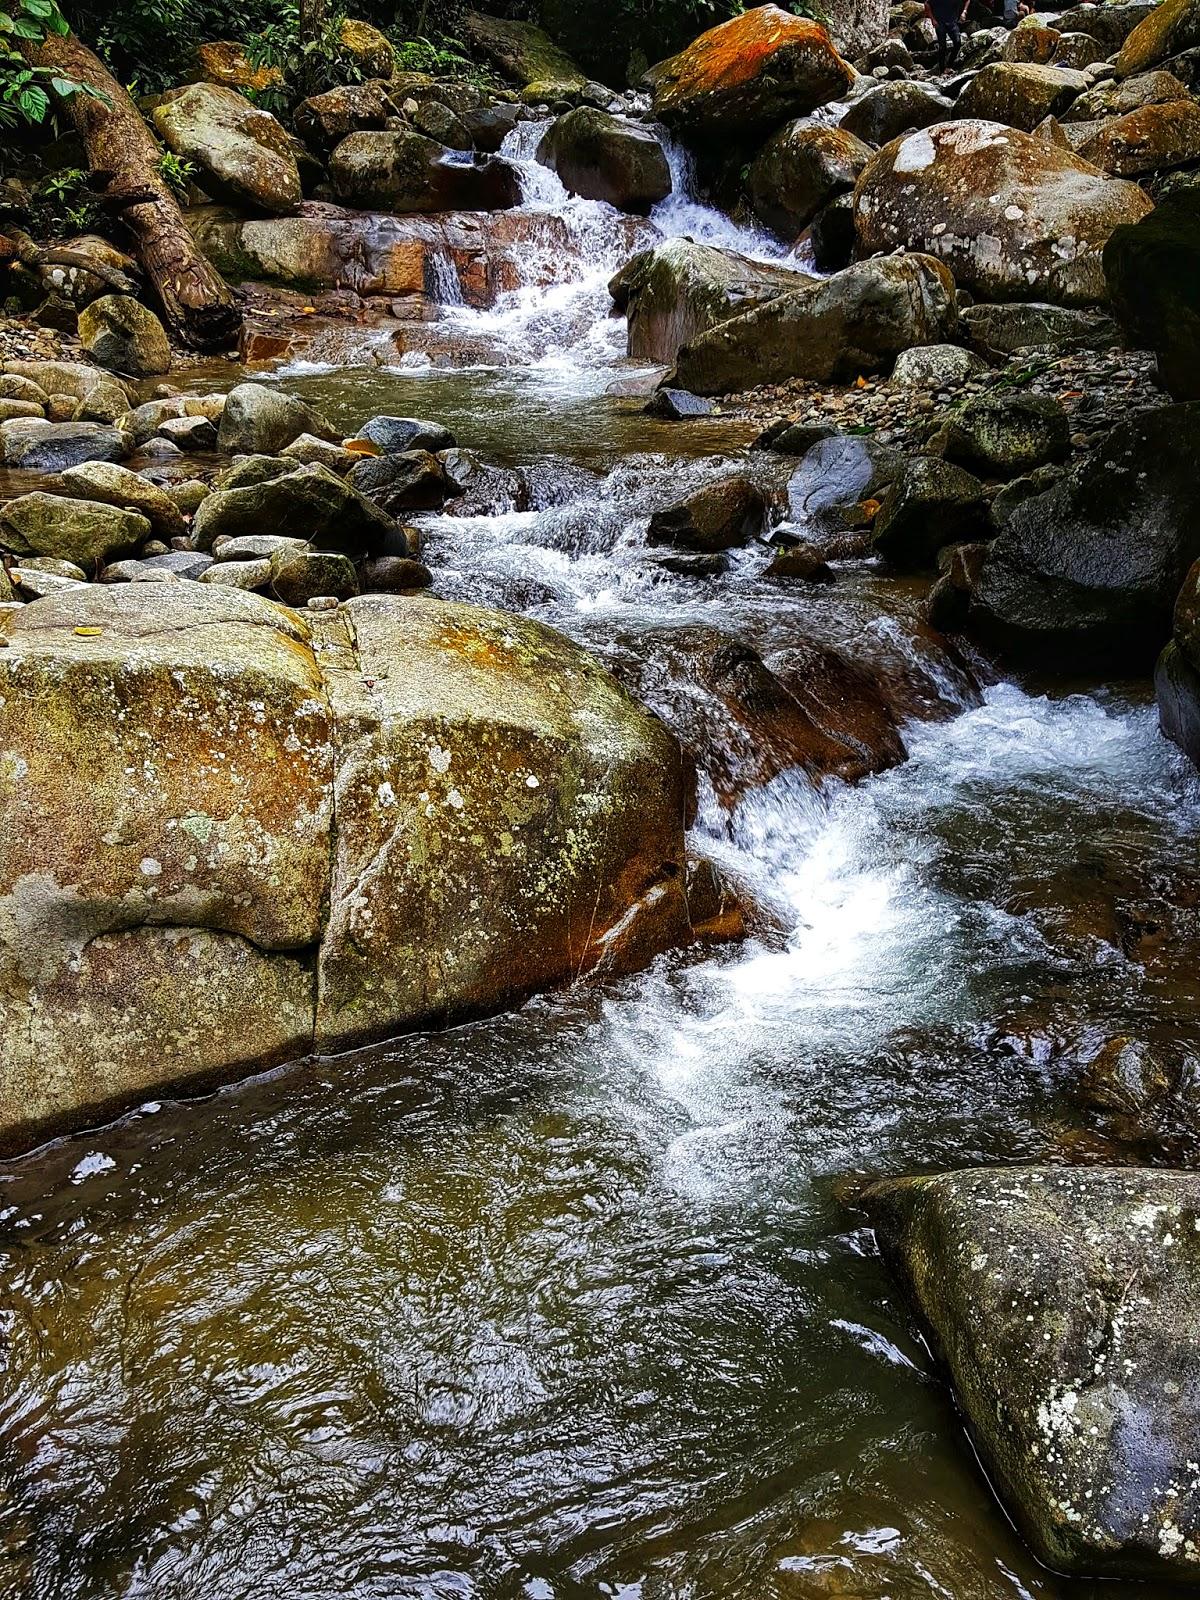 Air Terjun Lepoh, Hulu Langat